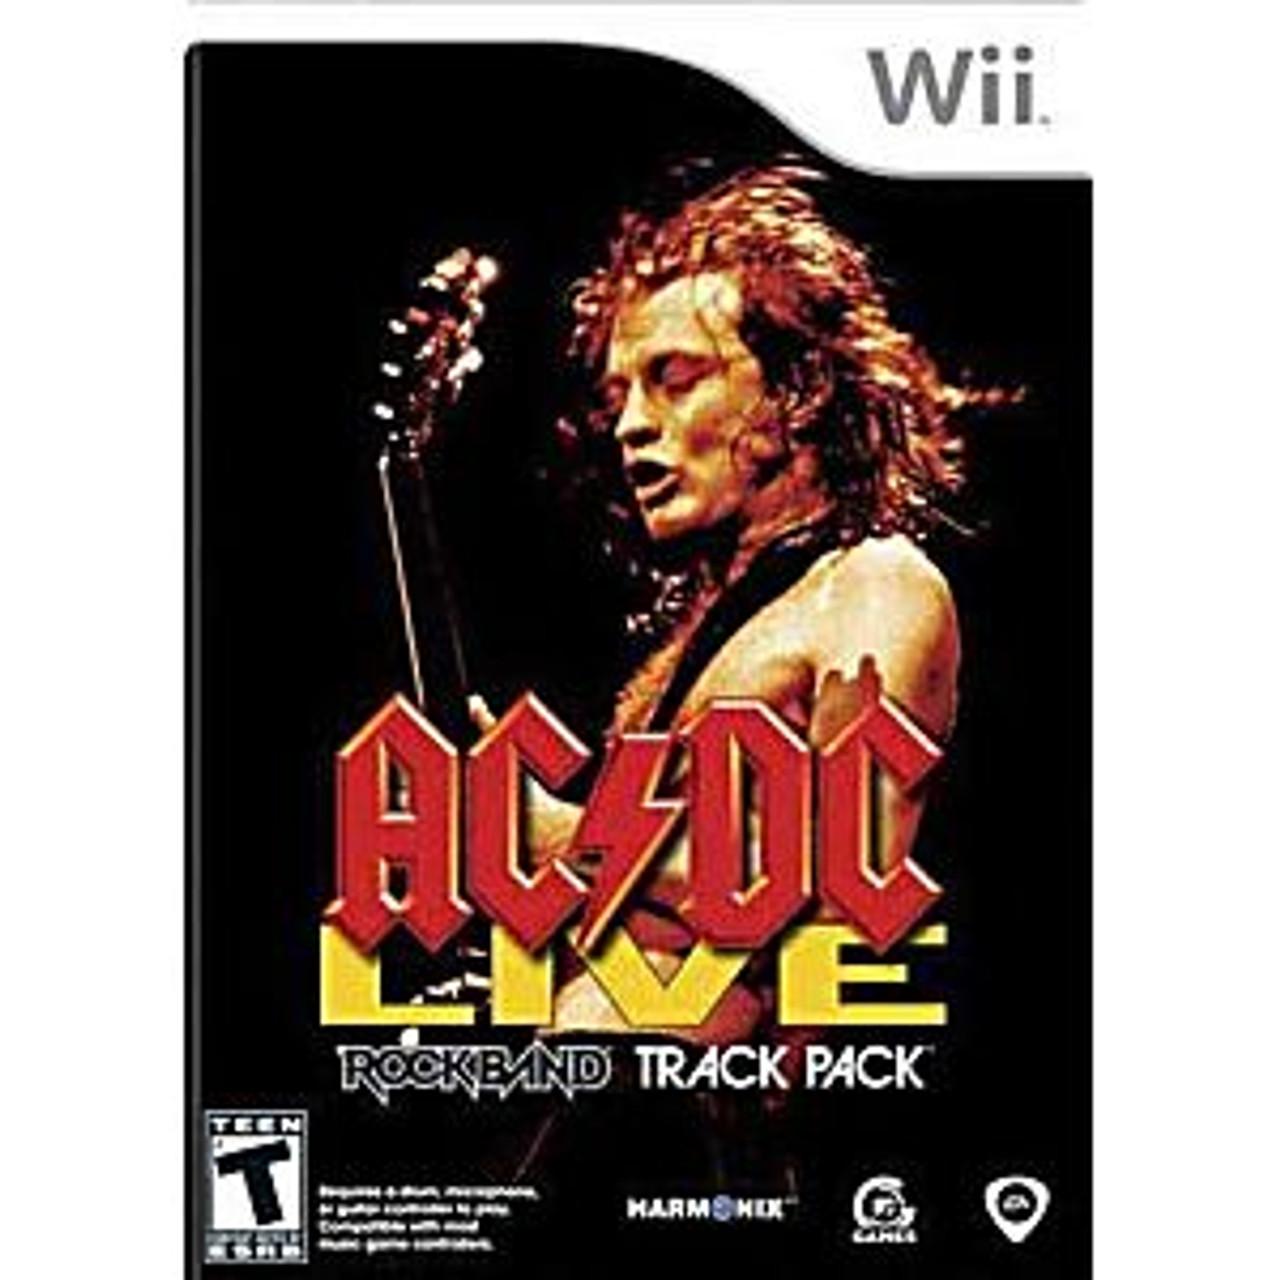 AC/DC LIVE ROCK BAND TRACK PACK (#014633191684)